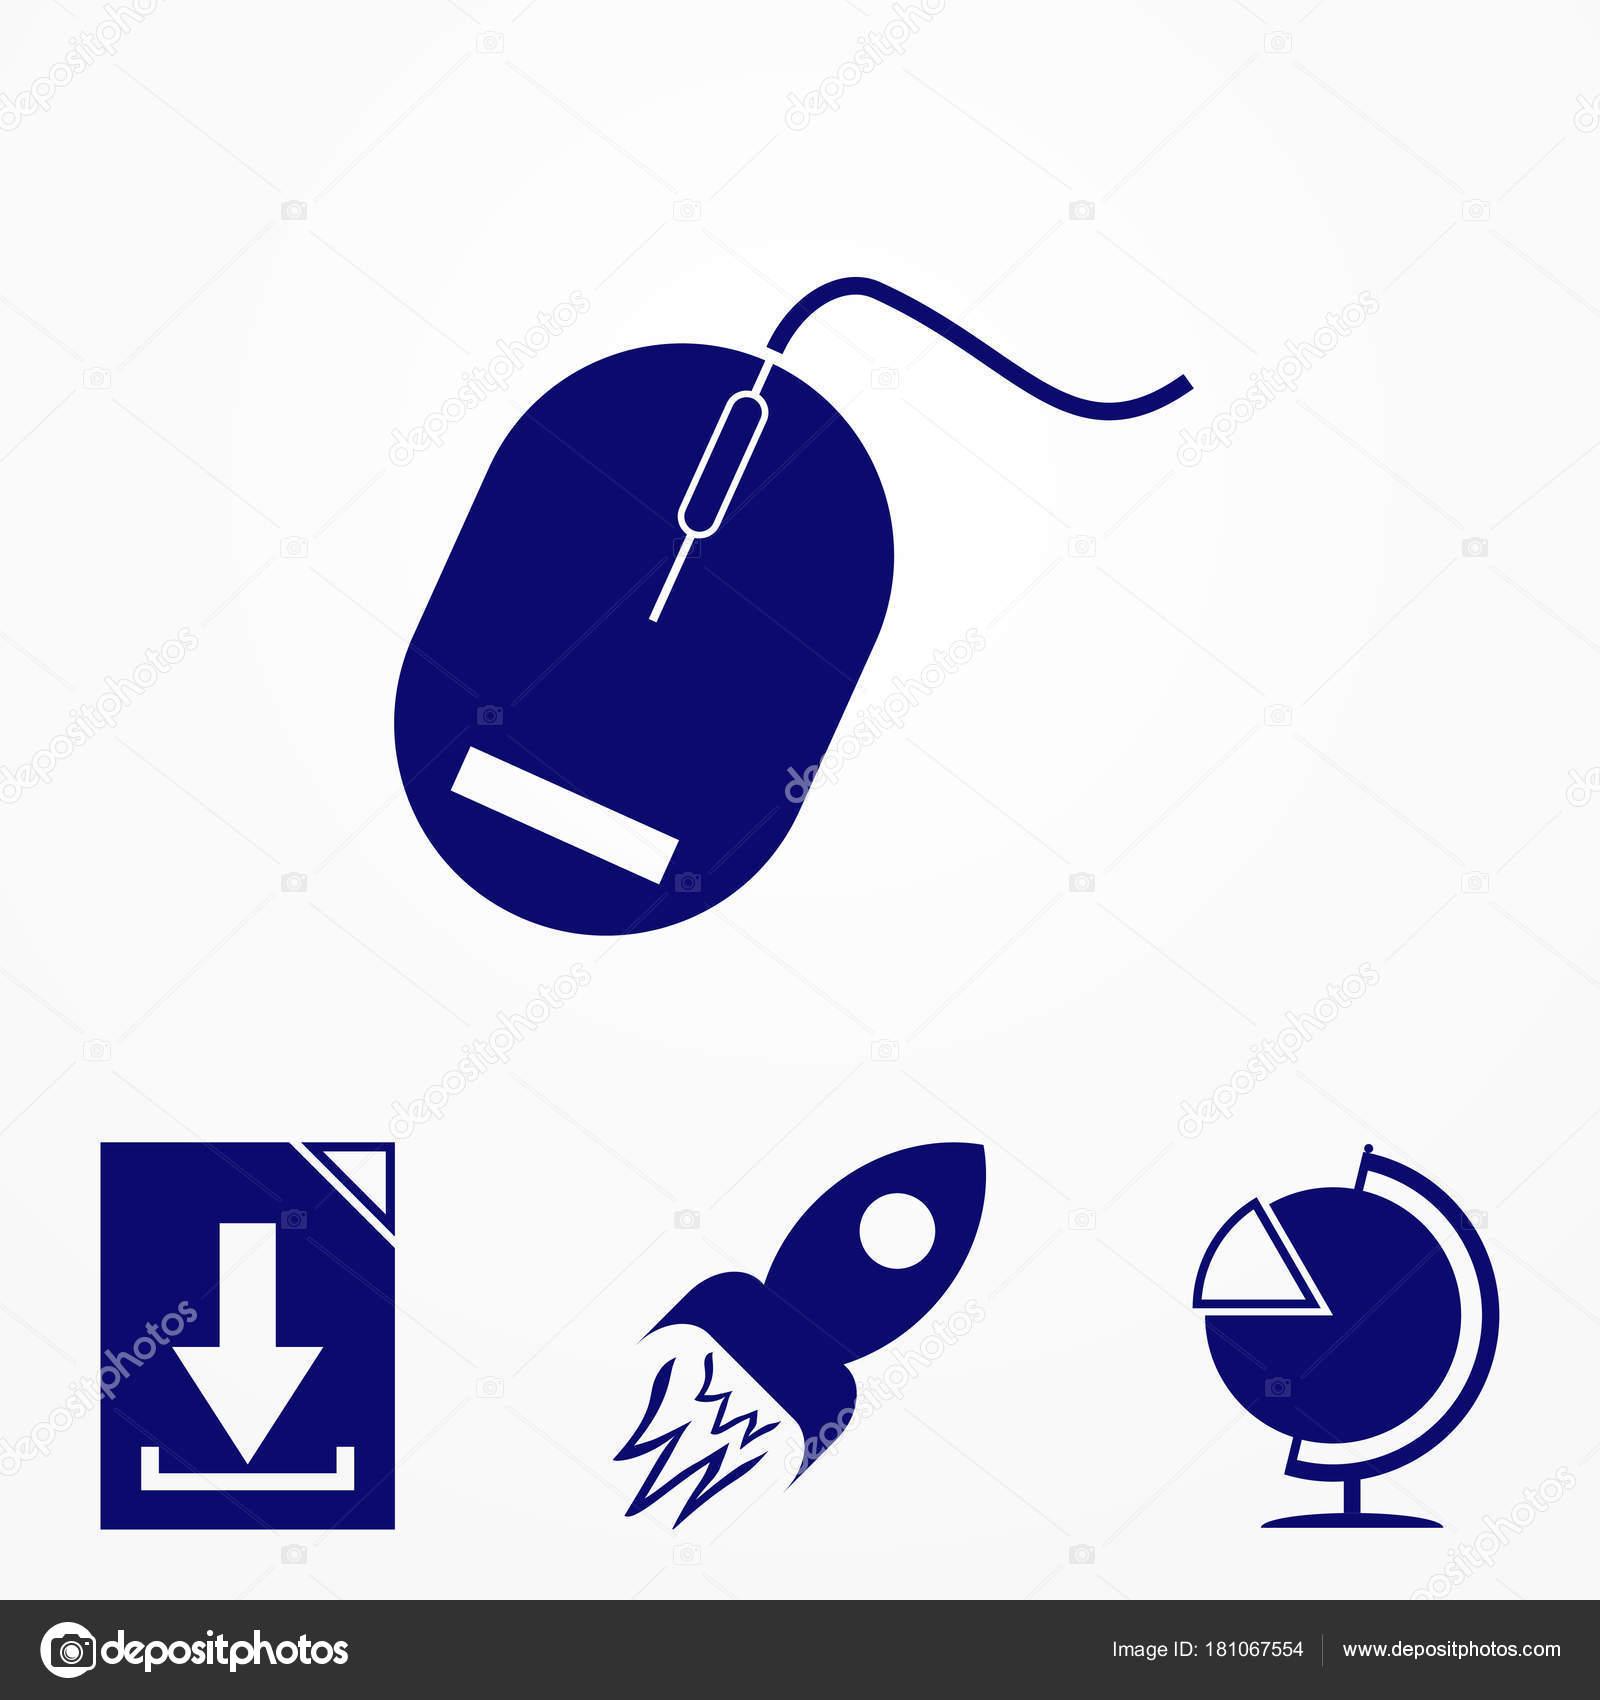 Computer-Maus Symbol im trendigen flachen Stil. Vektor-Illustration ...